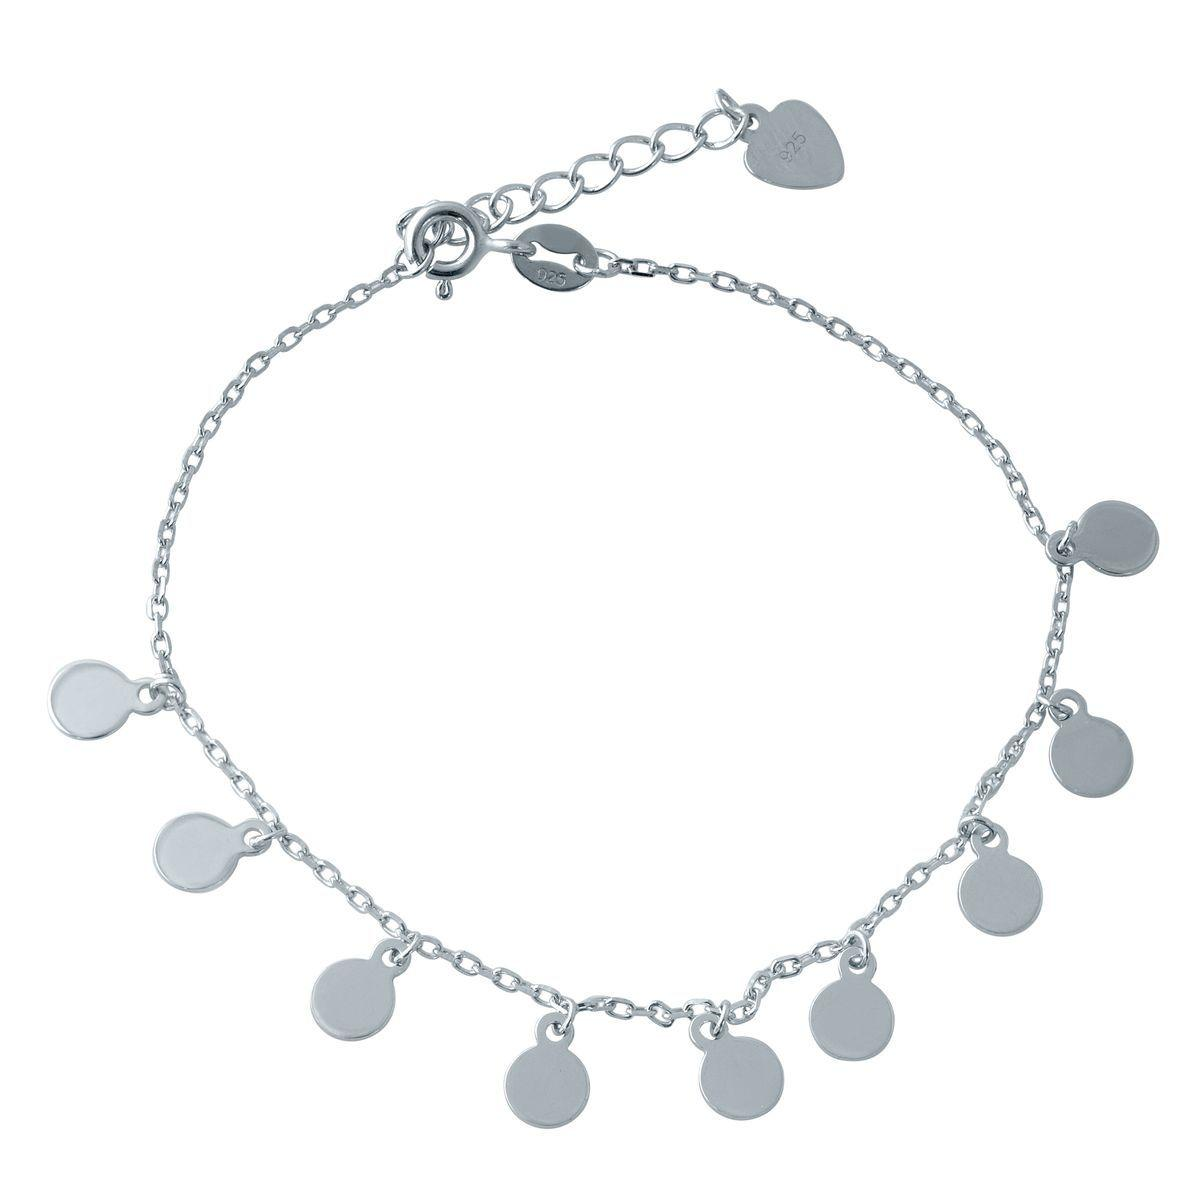 Серебряный браслет на ногу DreamJewelry без камней (2014386) 2326 размер